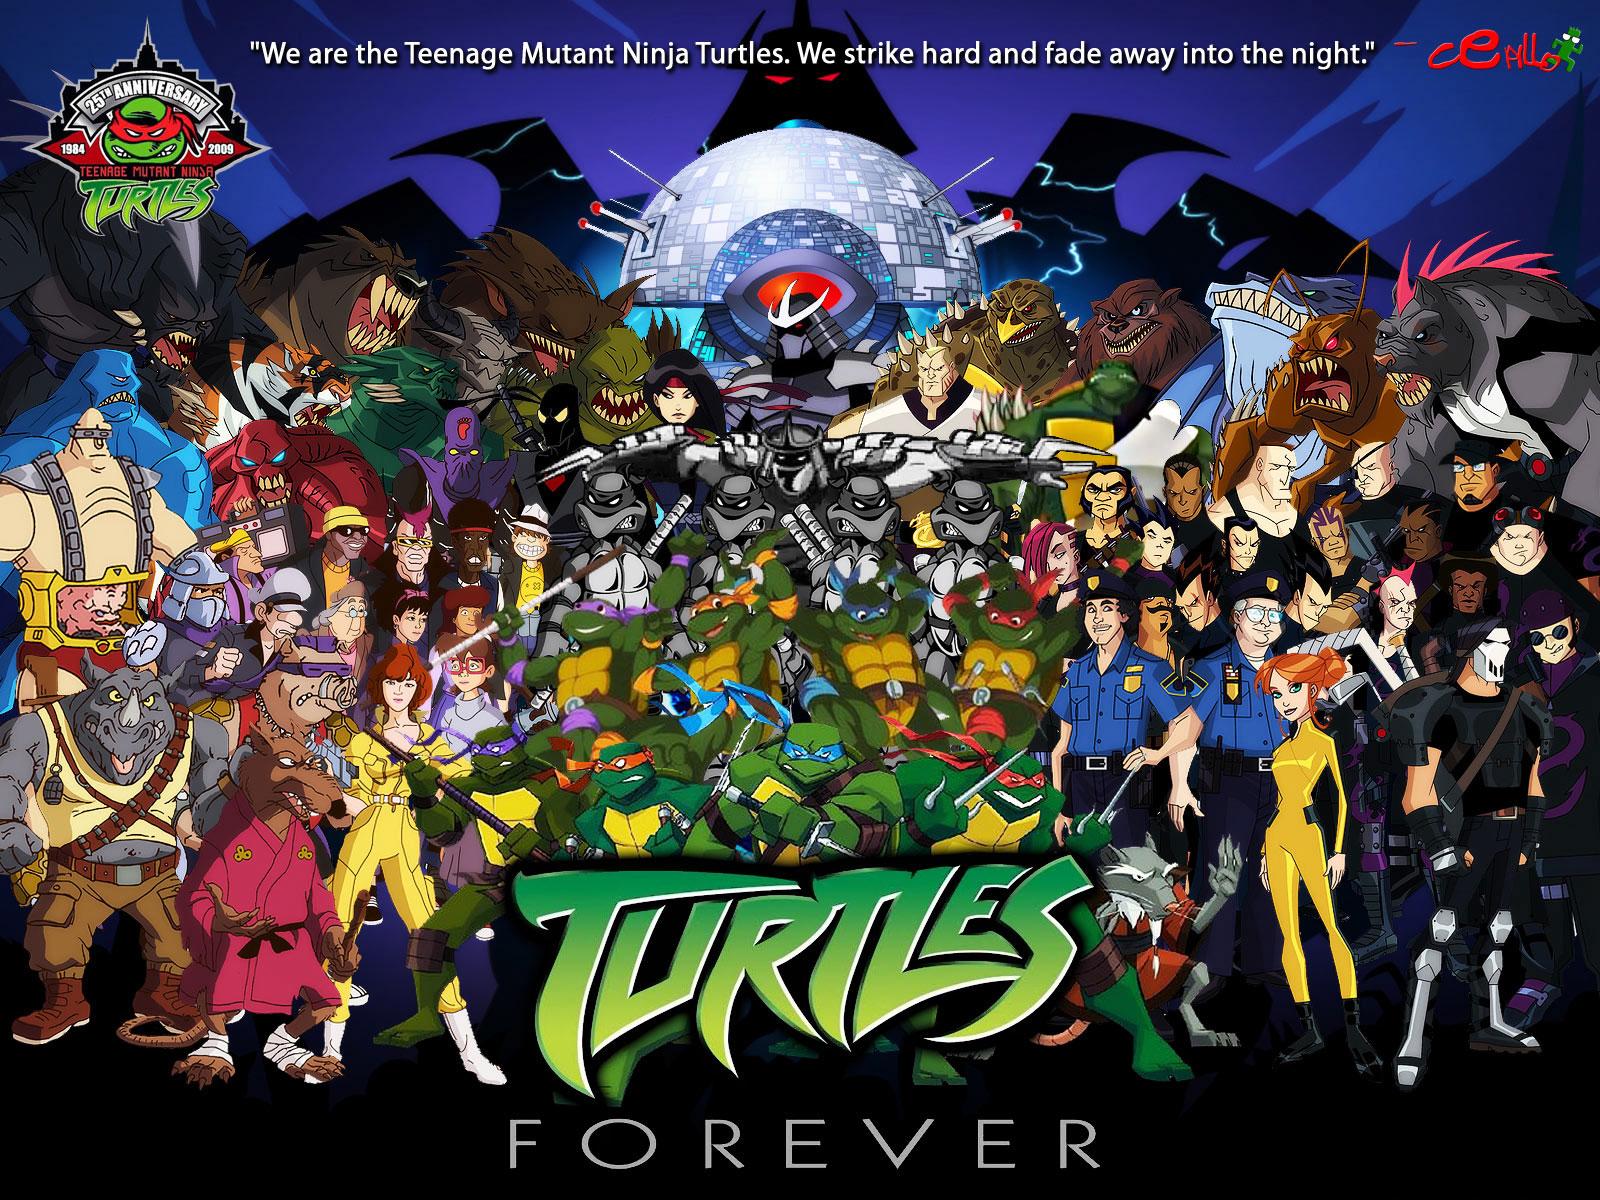 http://3.bp.blogspot.com/-L8vYM_2G06o/T0RxF7kBReI/AAAAAAAABVc/z1Sa3sZVgZo/s1600/Ninja-Turtles-Forever-1600x1200-Wallpaper-ToonsWallpapers.com-.jpg